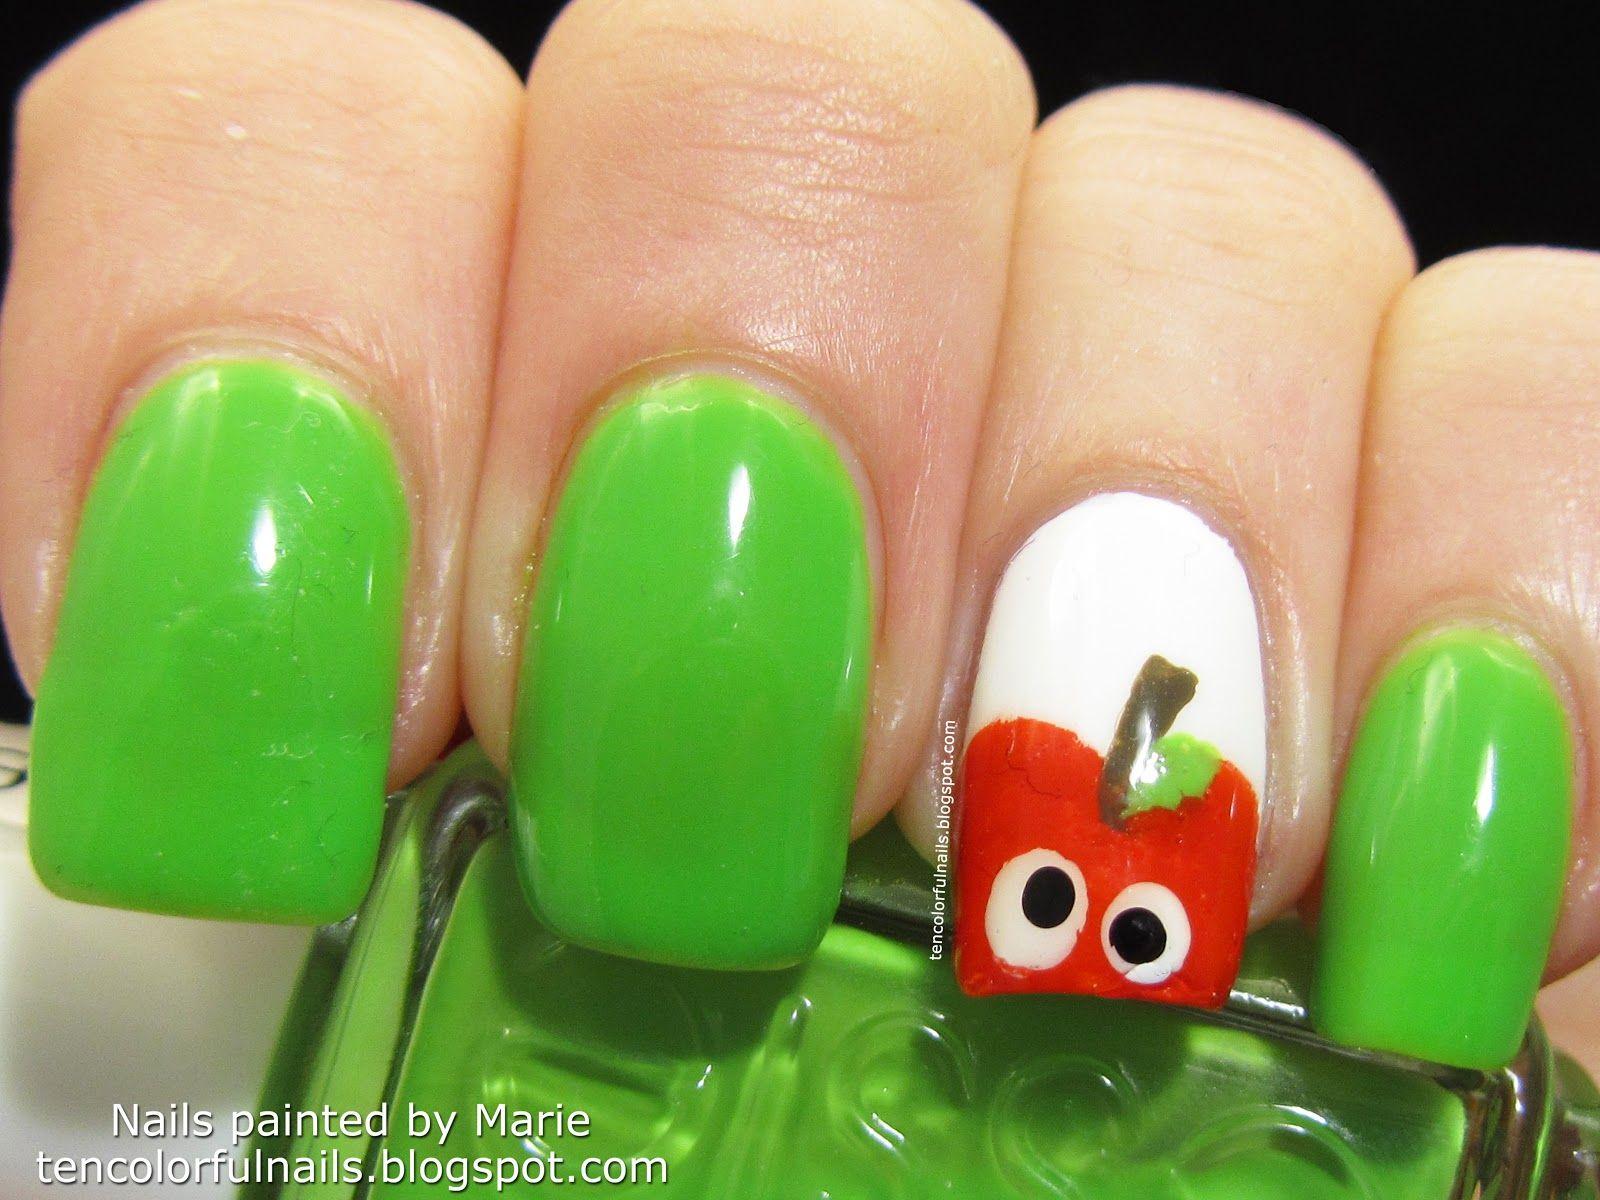 Ten Colorful Nails: Bright Green Apple Nail Art   Beauty tips ...